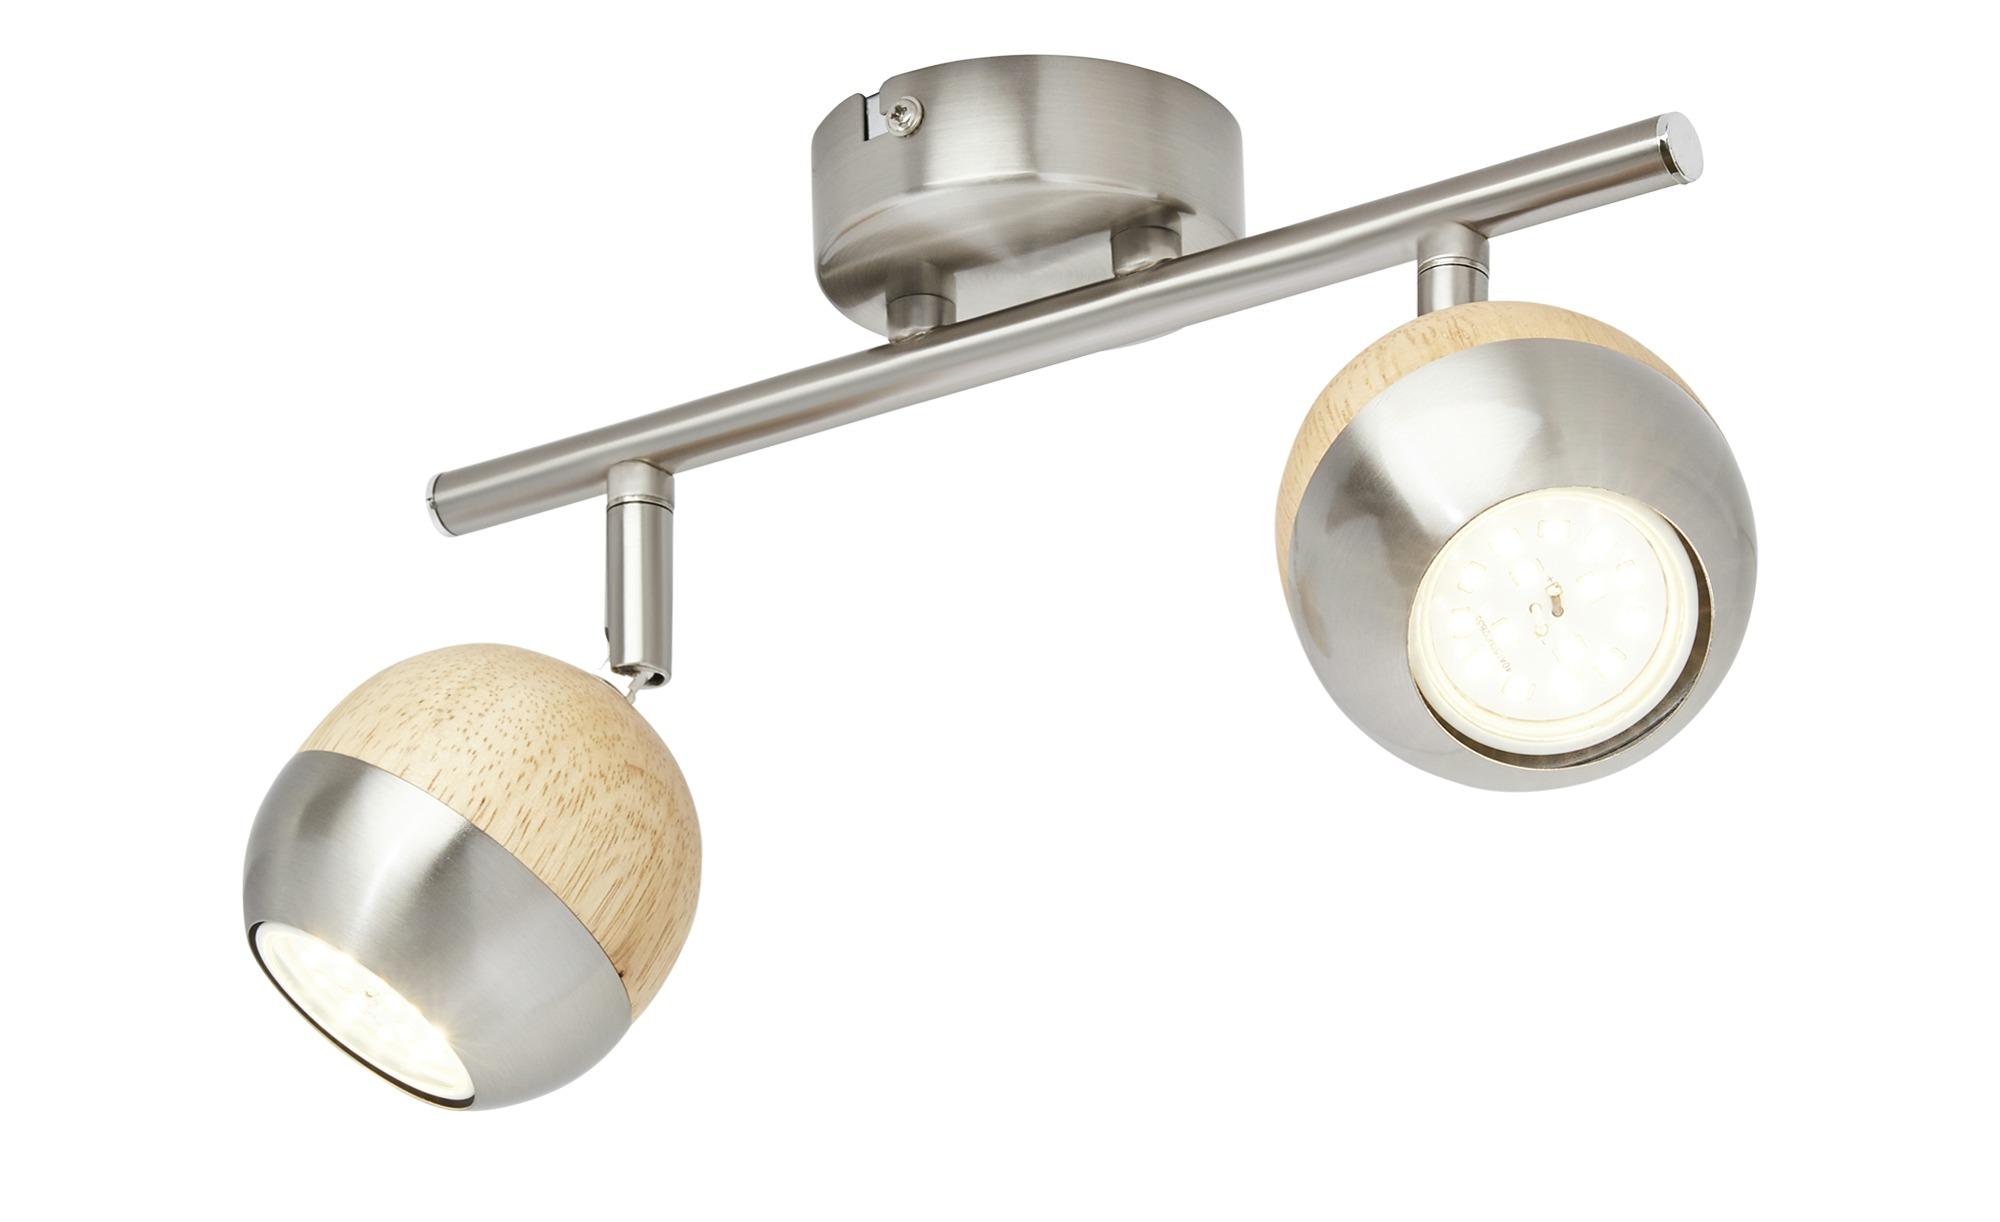 KHG LED-Spot, 2-flammig mit Holz ¦ braun ¦ Maße (cm): B: 8 H: 14 Lampen & Leuchten > LED-Leuchten > LED-Strahler & Spots - Höffner